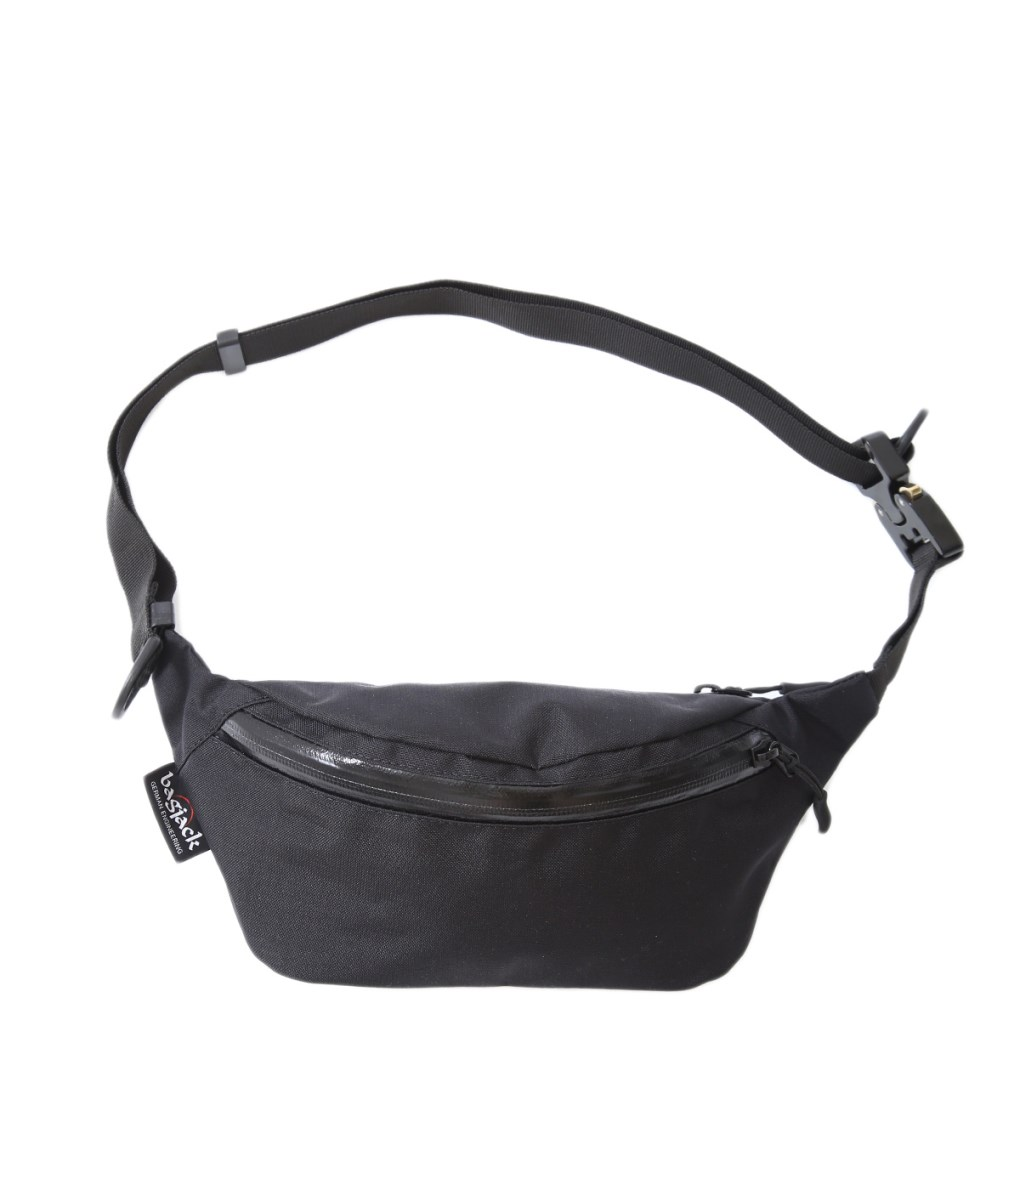 BAGJACK / バッグジャック : 別注hipbag OC(waist pouch) : バッグ ポーチ ボディバッグ : BJ-OPTION-MA-HIPBAG 【MUS】